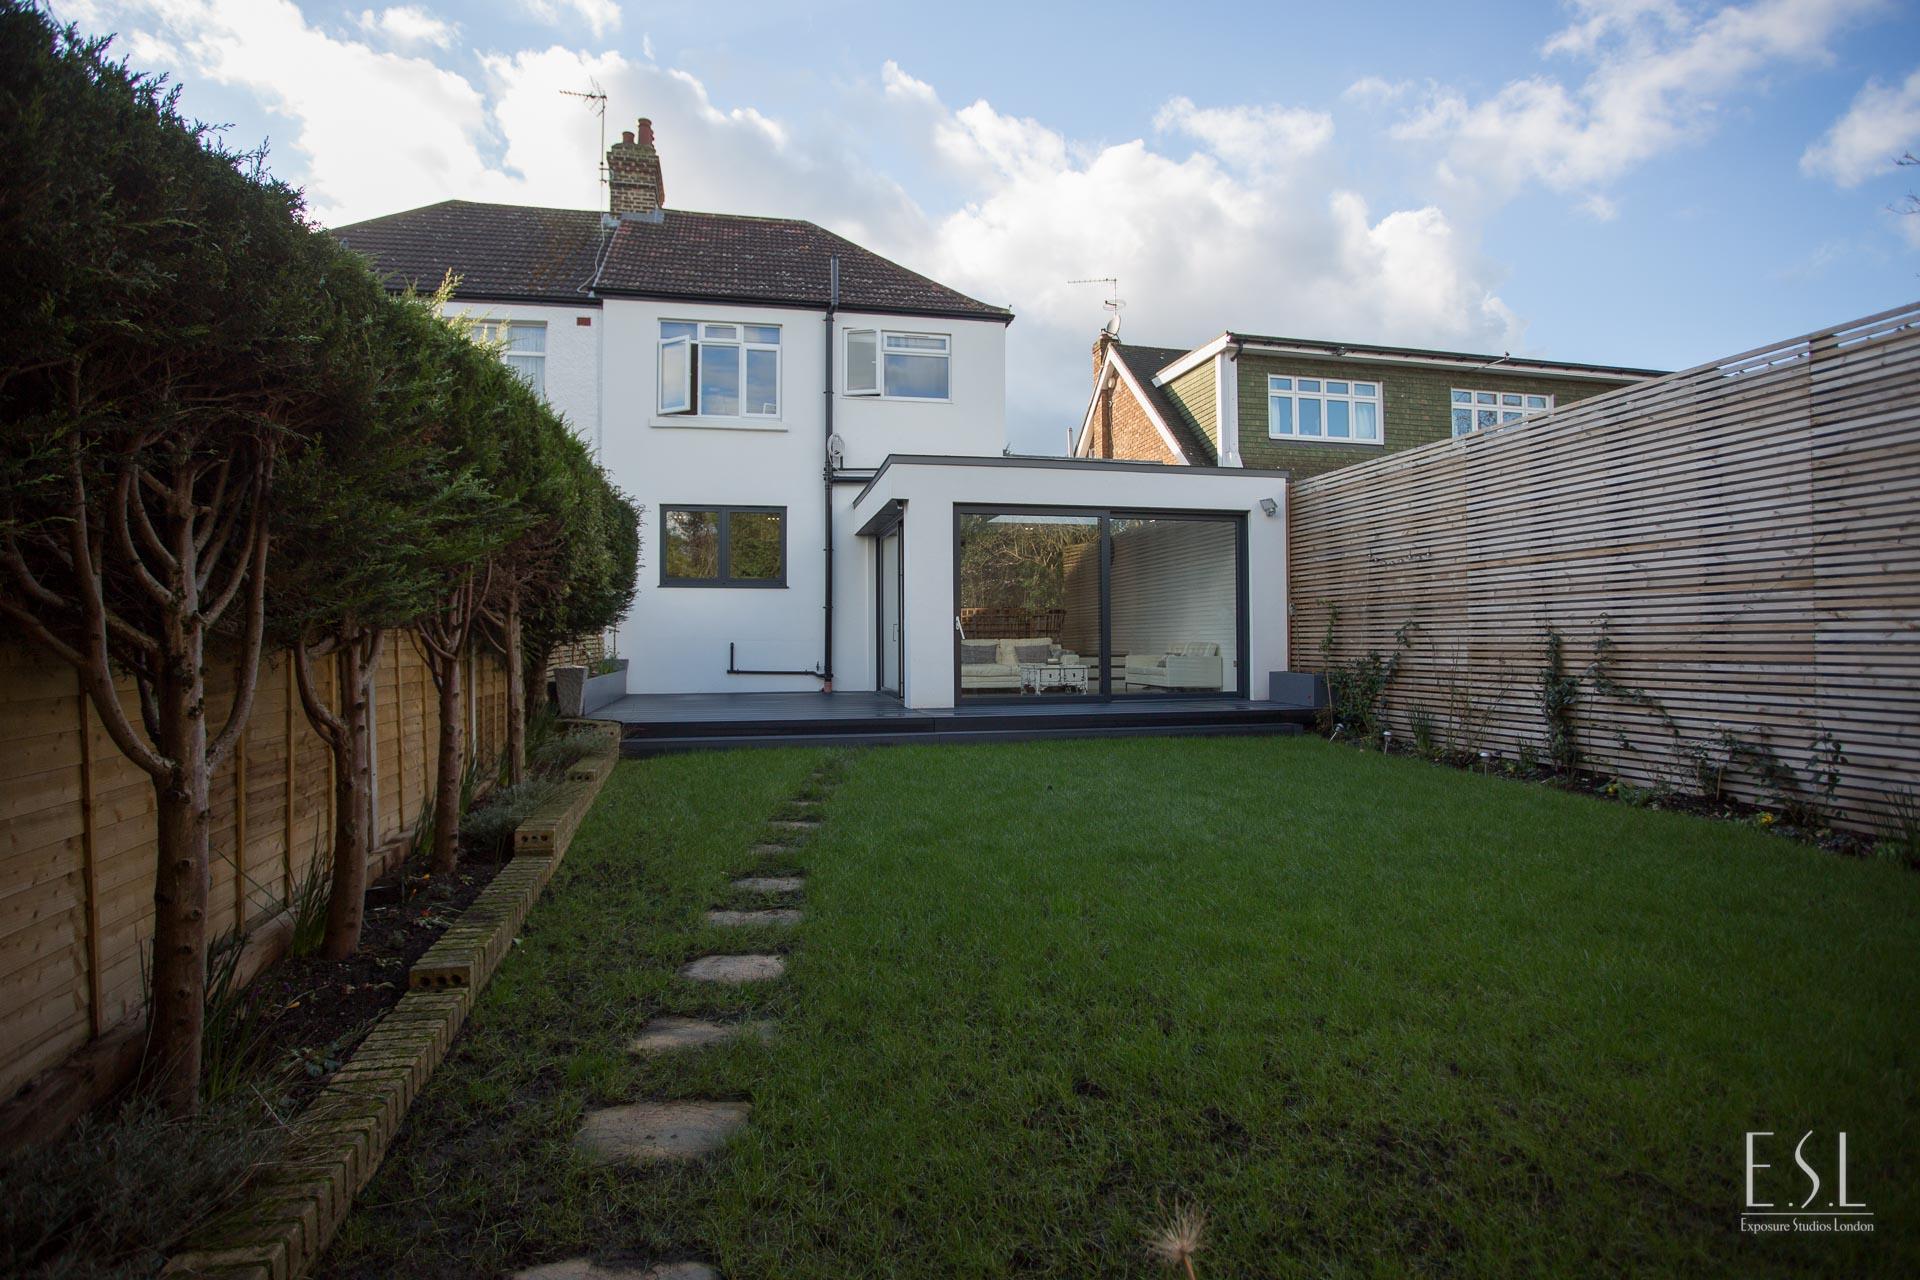 Builders, Winchmore Hill, London House rennovation & Refurbishment 23